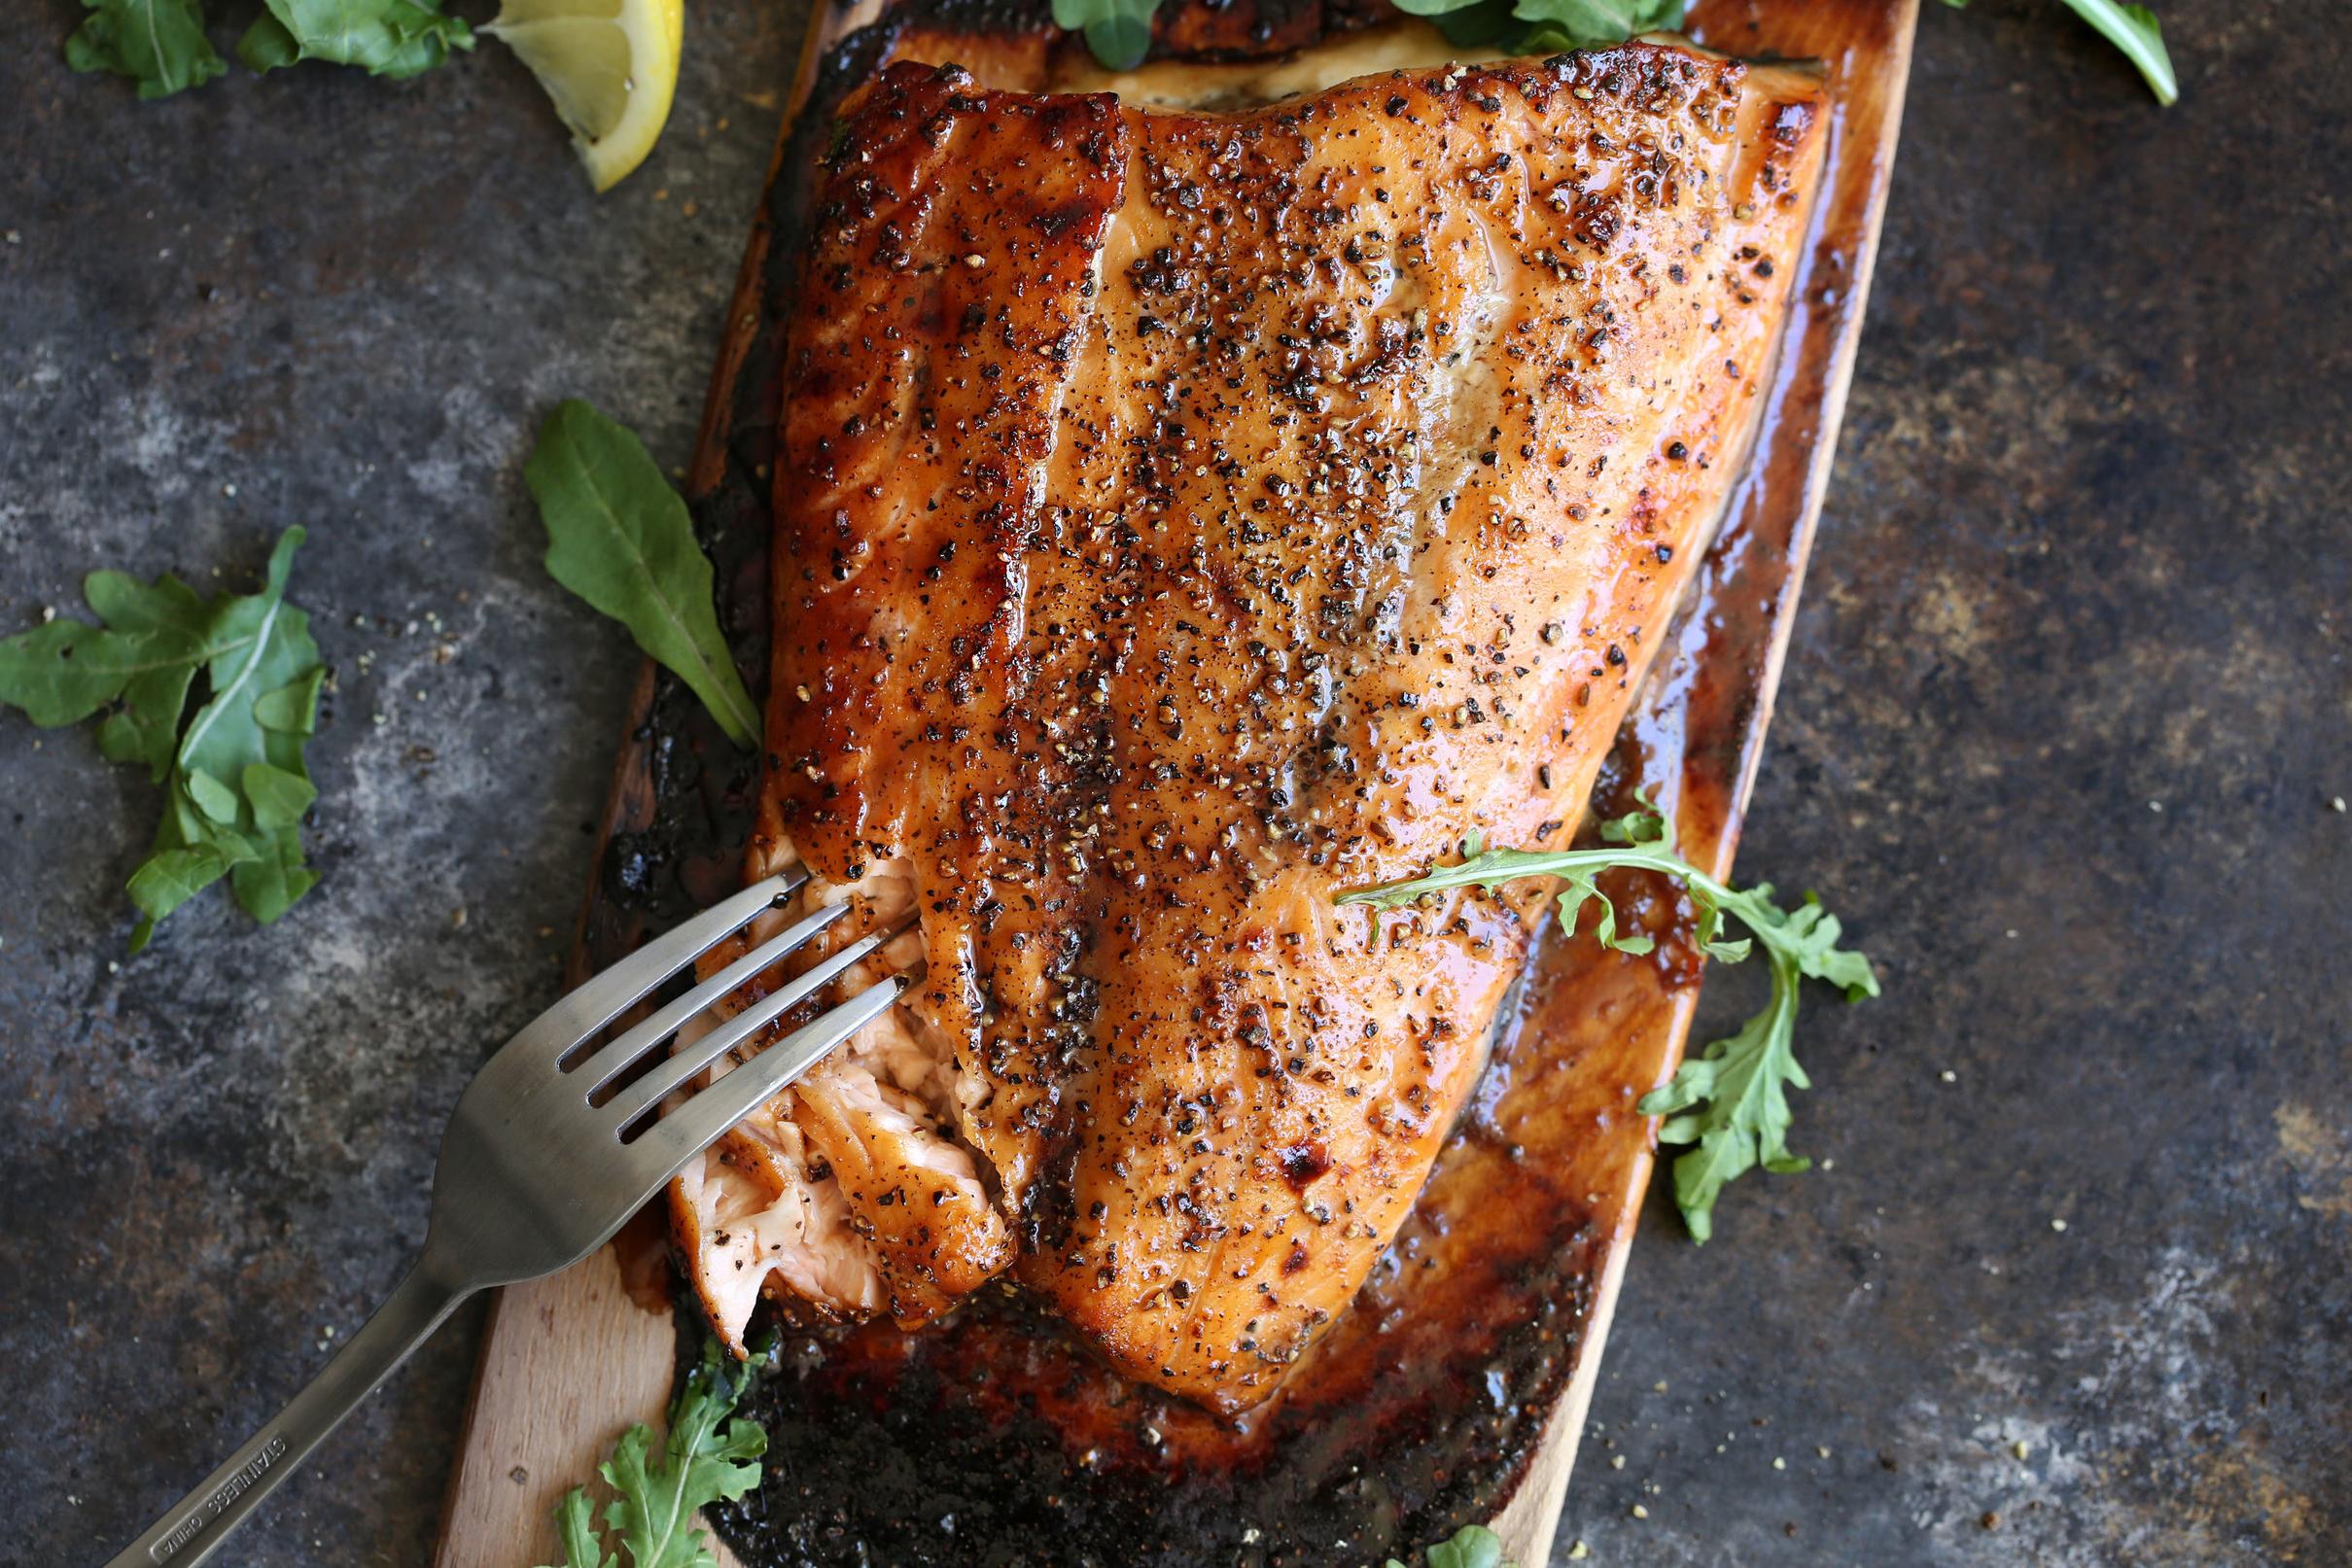 cedar plank salmon with brown sugar and black pepper